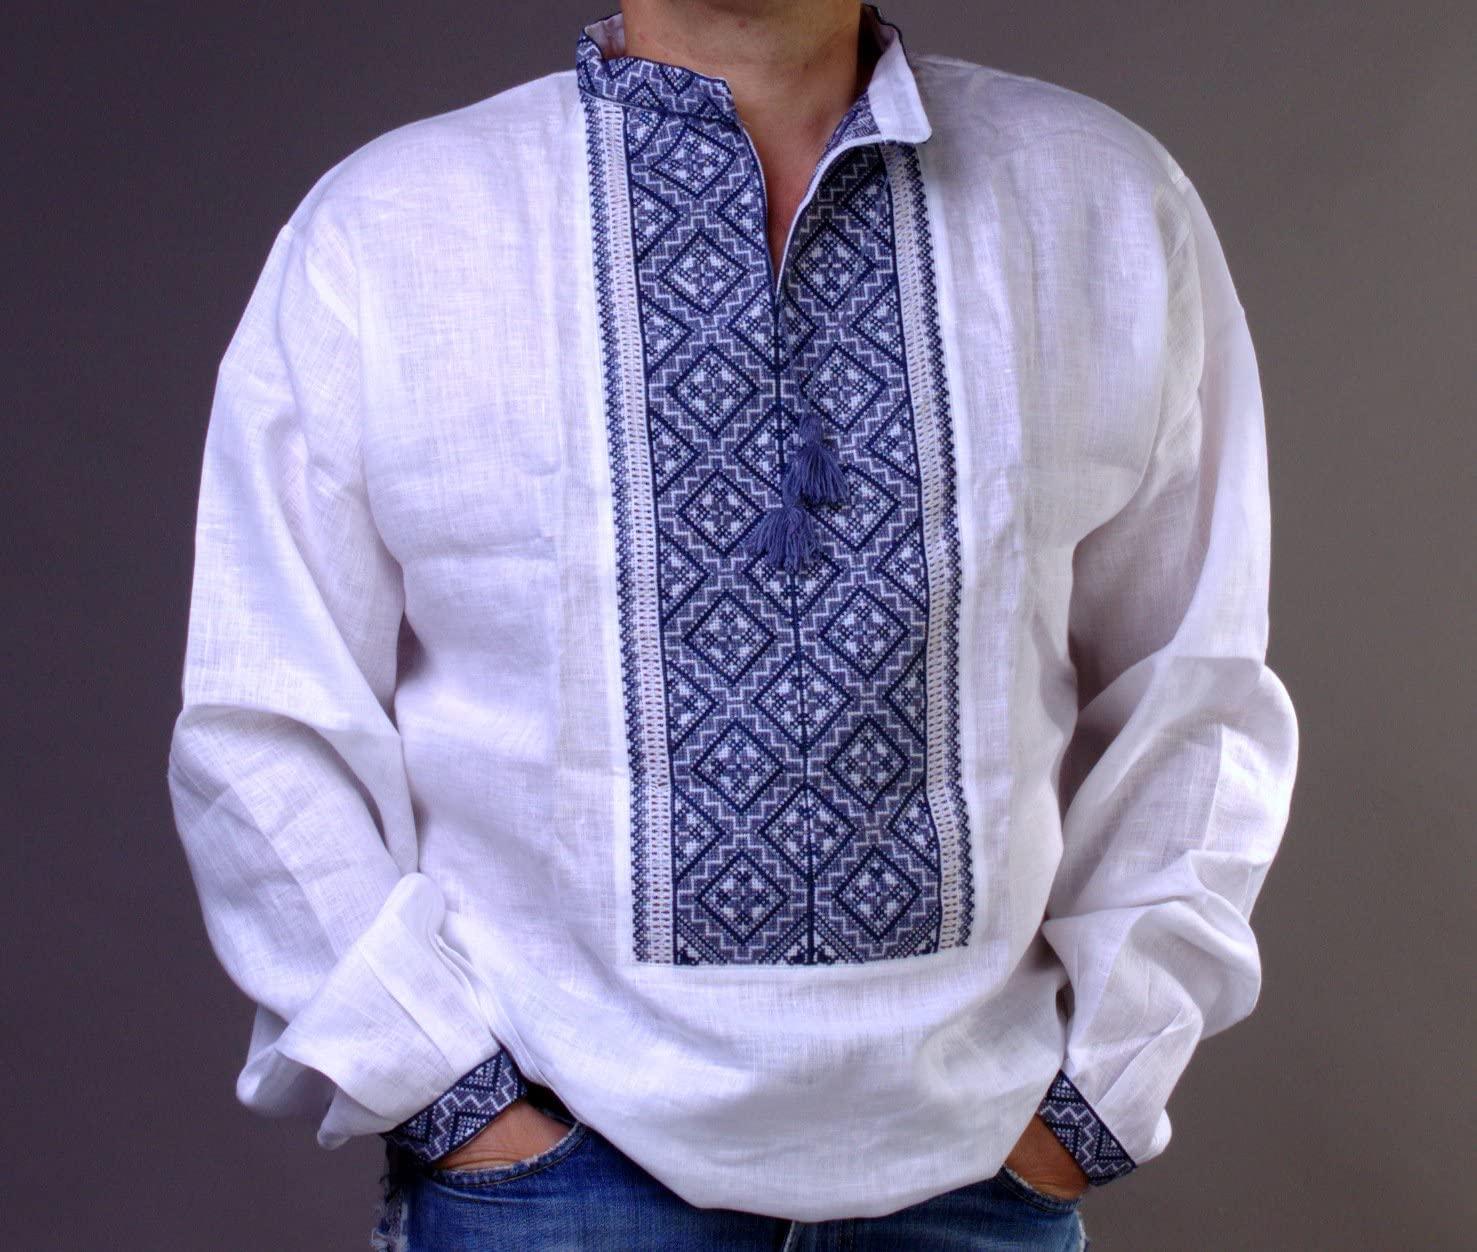 Vyshyvanka Men Shirt Ukraine Handmade White Linen Gray Embroidered Ukrainian Gift (4X-Large)